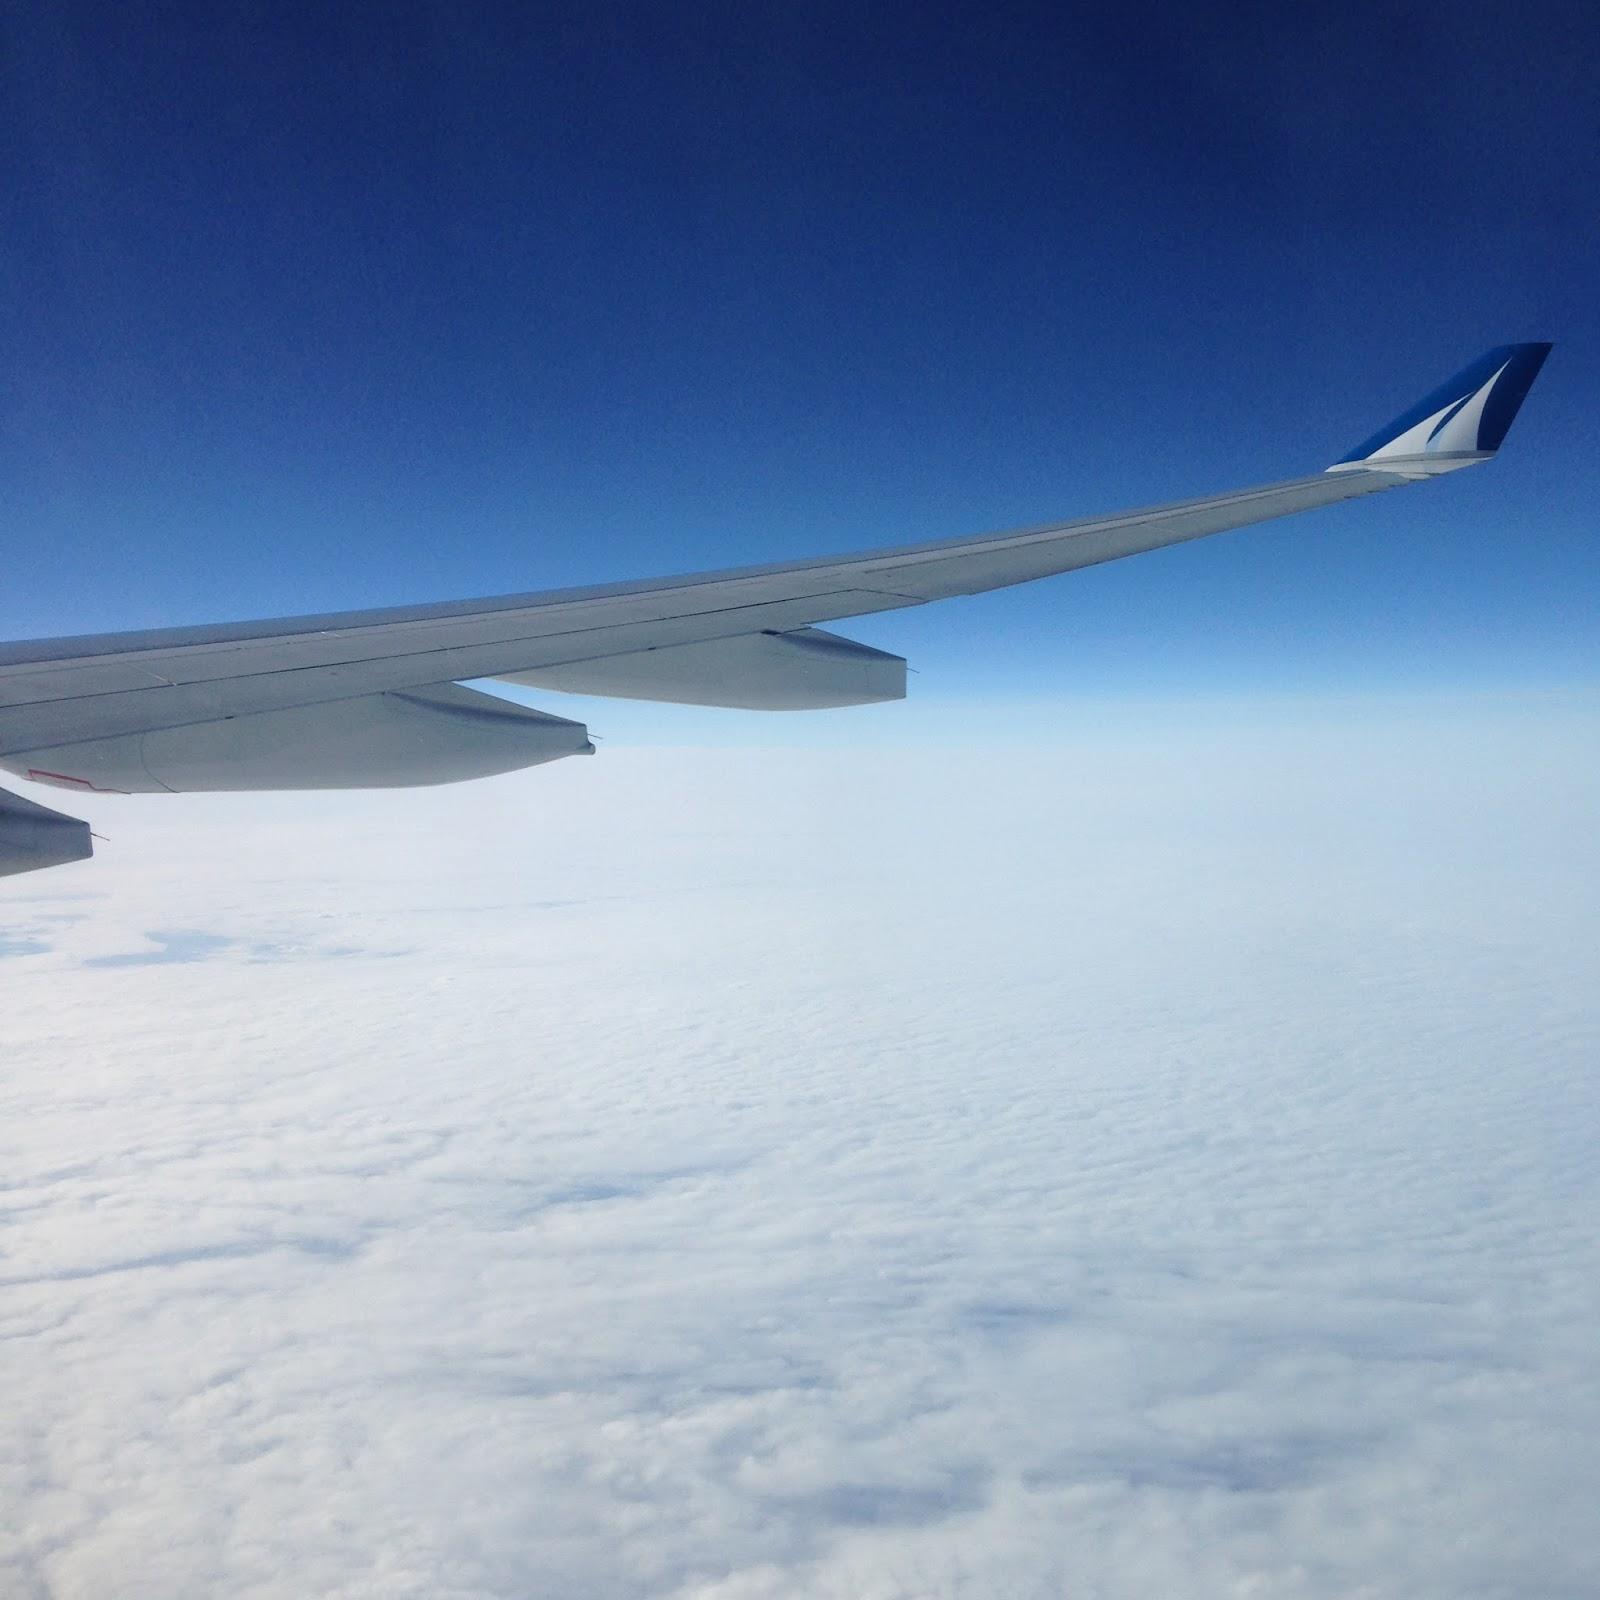 aile avion nuage corsair